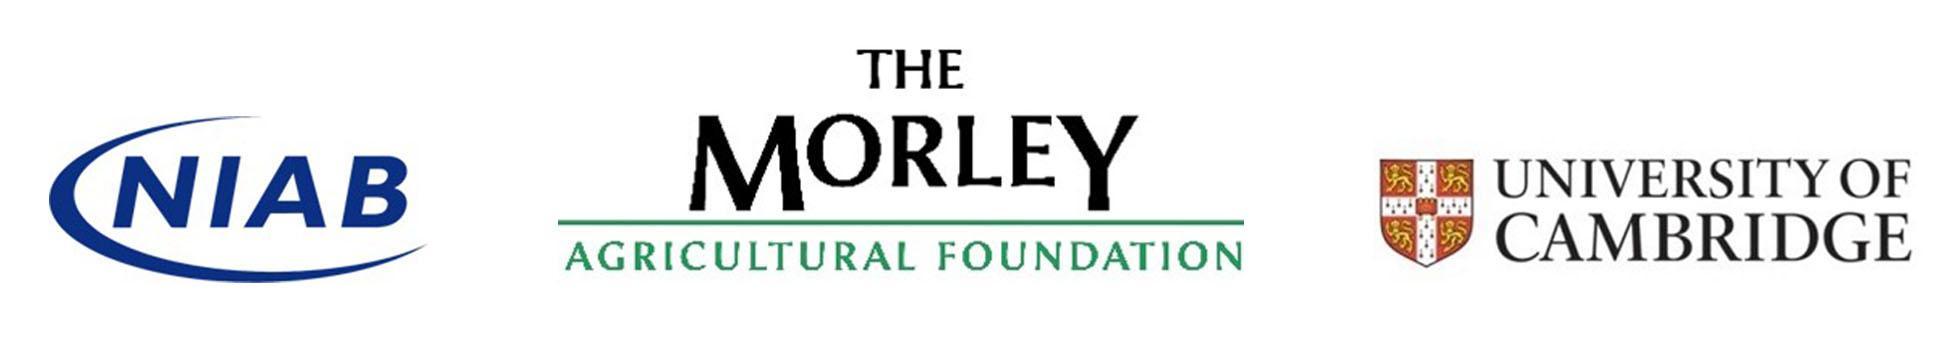 Logo for The Morley Agricultural Foundation